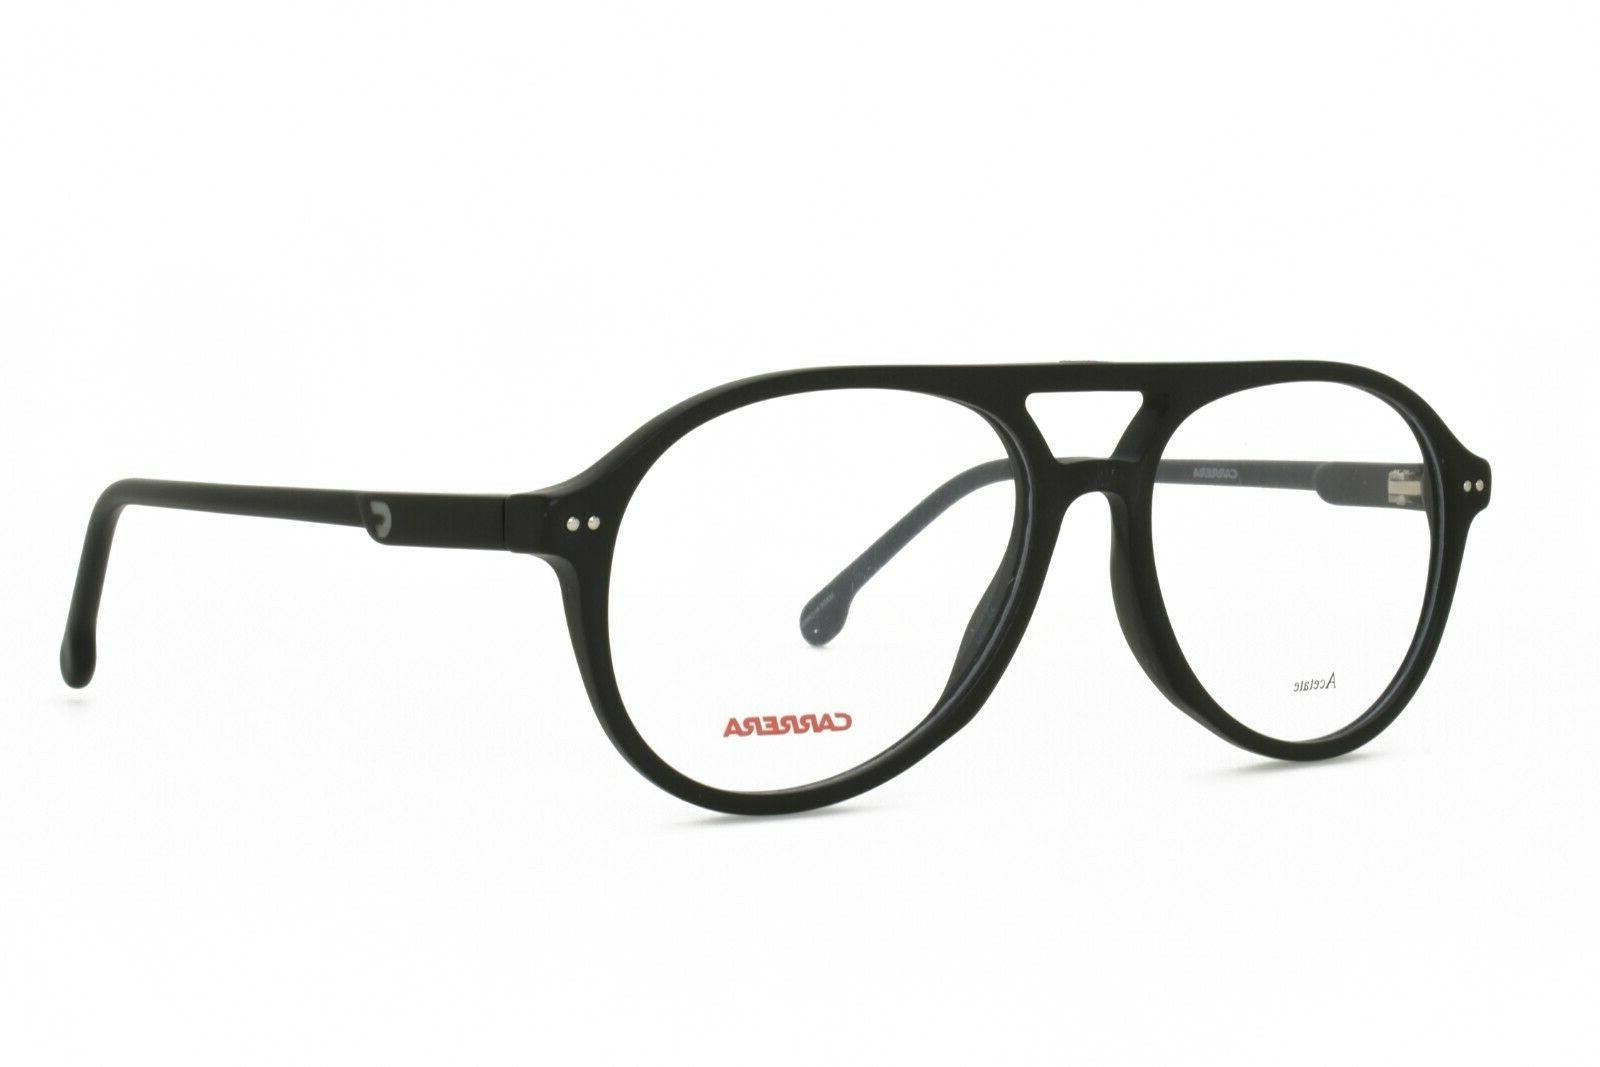 2002t 003 new authentic rx eyeglasses 51